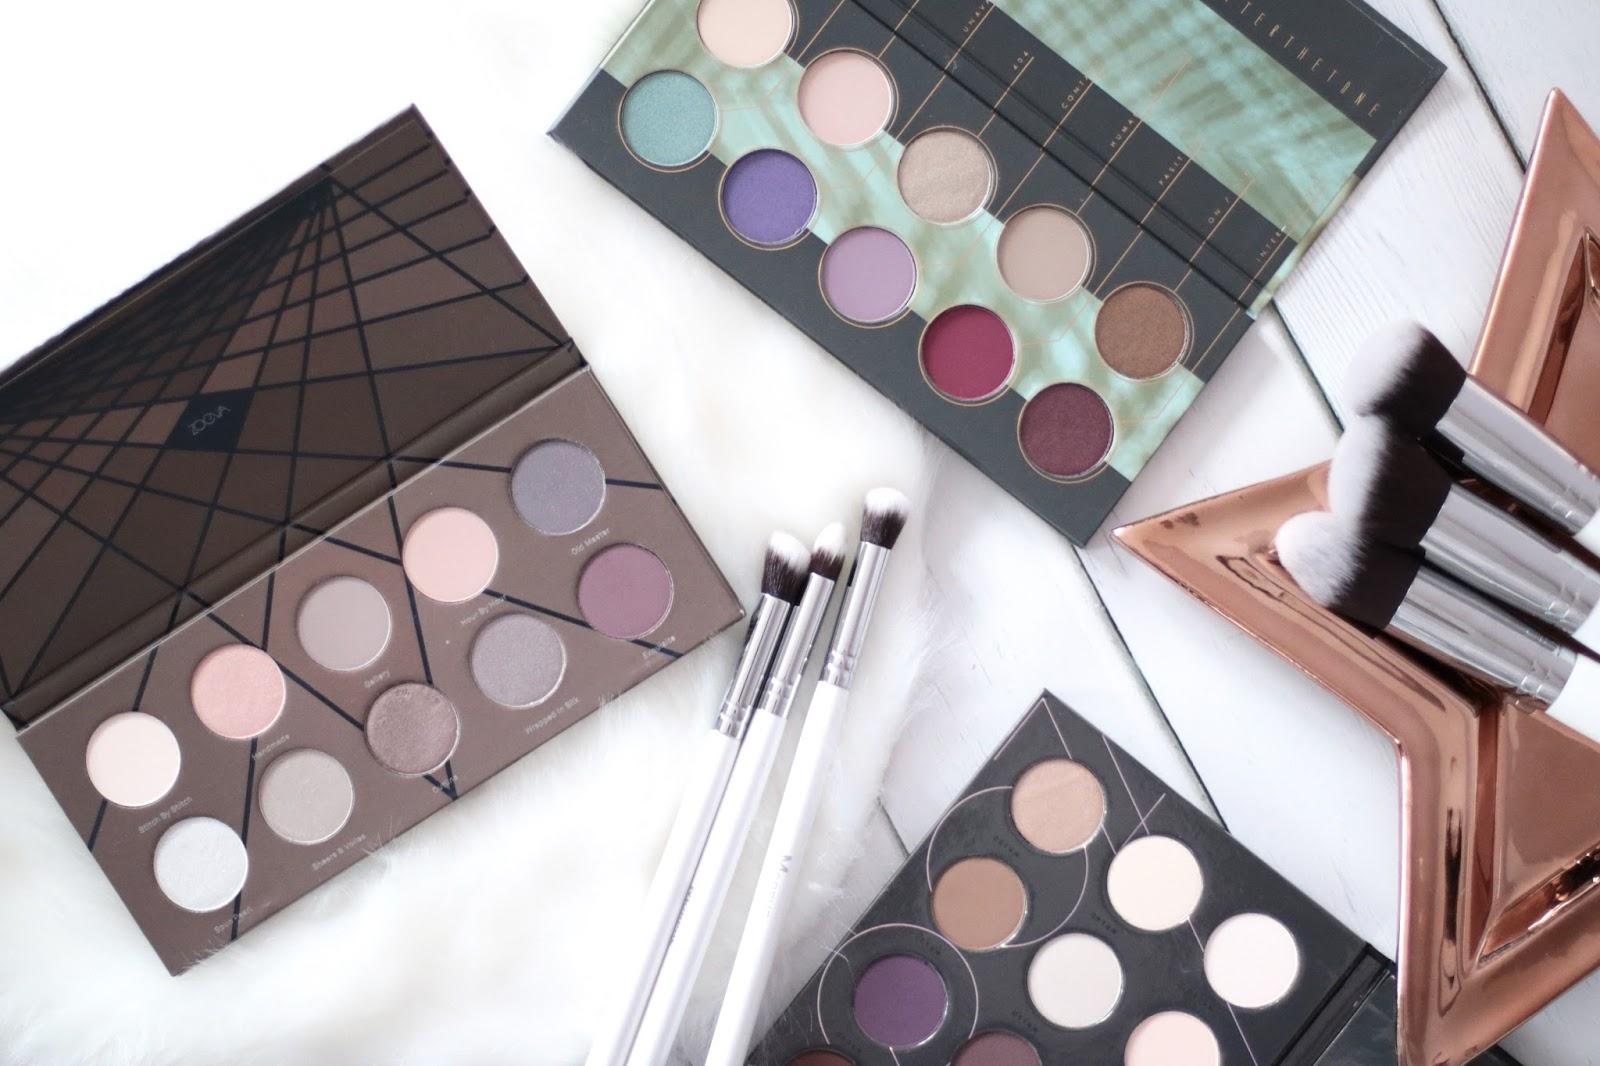 Ho Ho Ho Santa's Gift - Zoeva Offline Eyeshadow Palette, En Taupe, Warm Spectrum ( Part I )